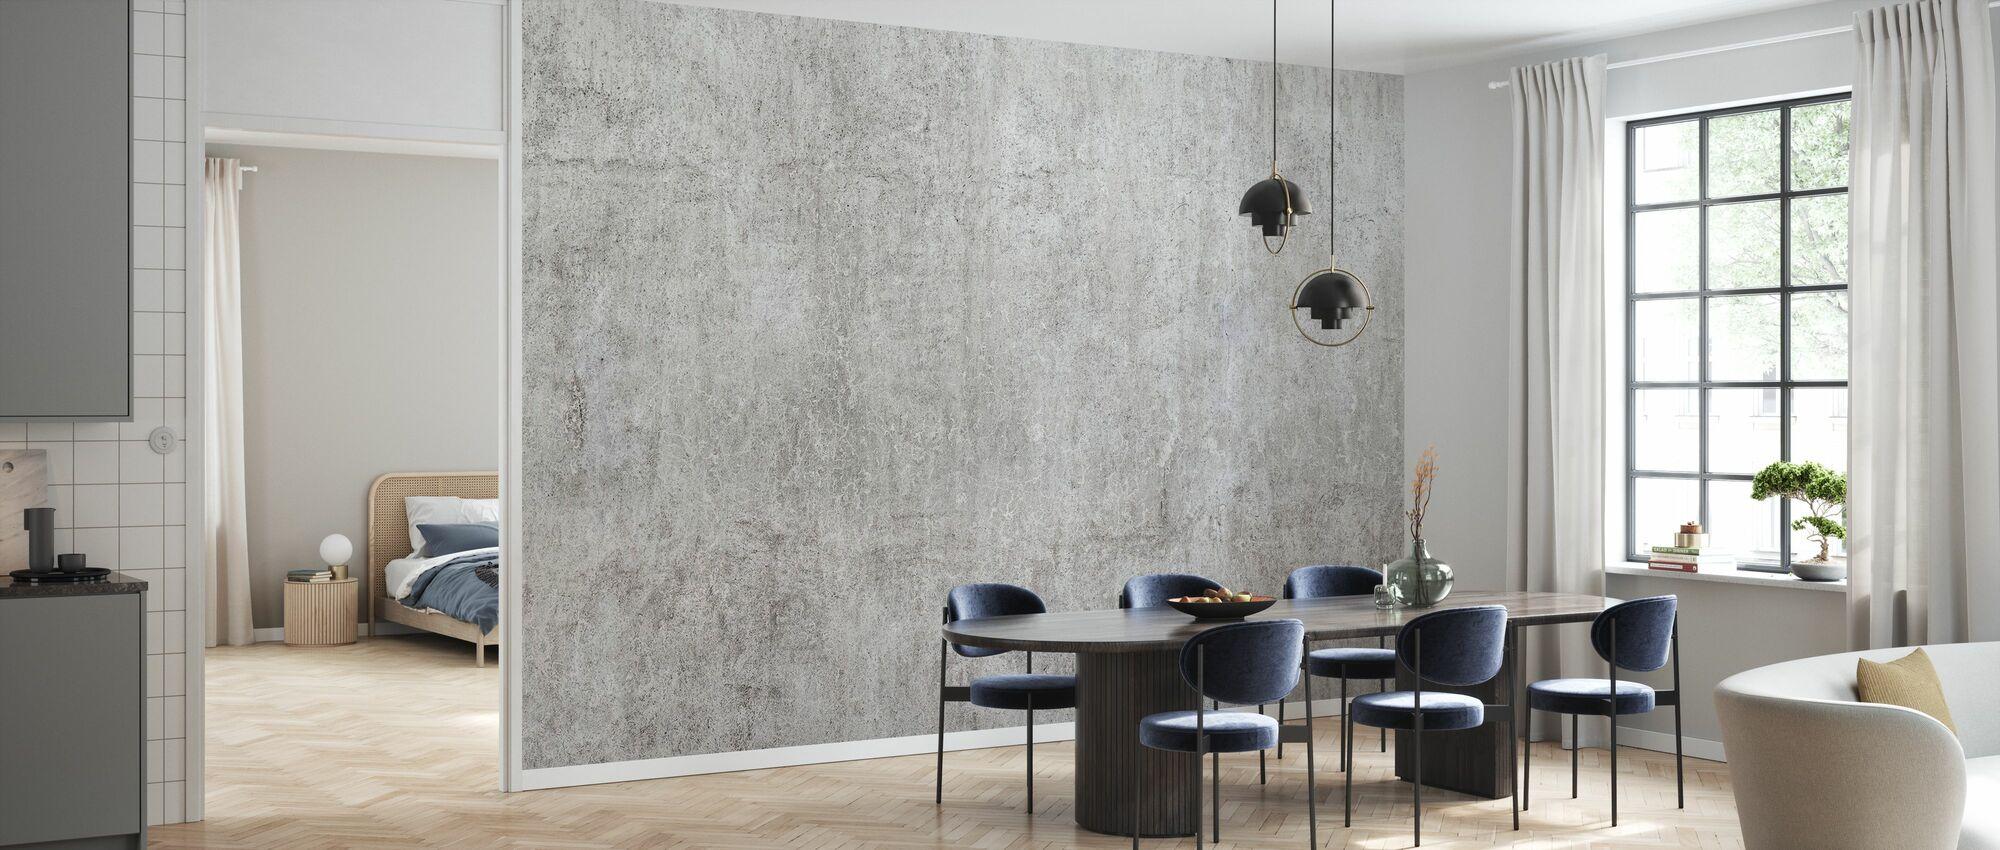 Industrial Concrete Wall - Wallpaper - Kitchen